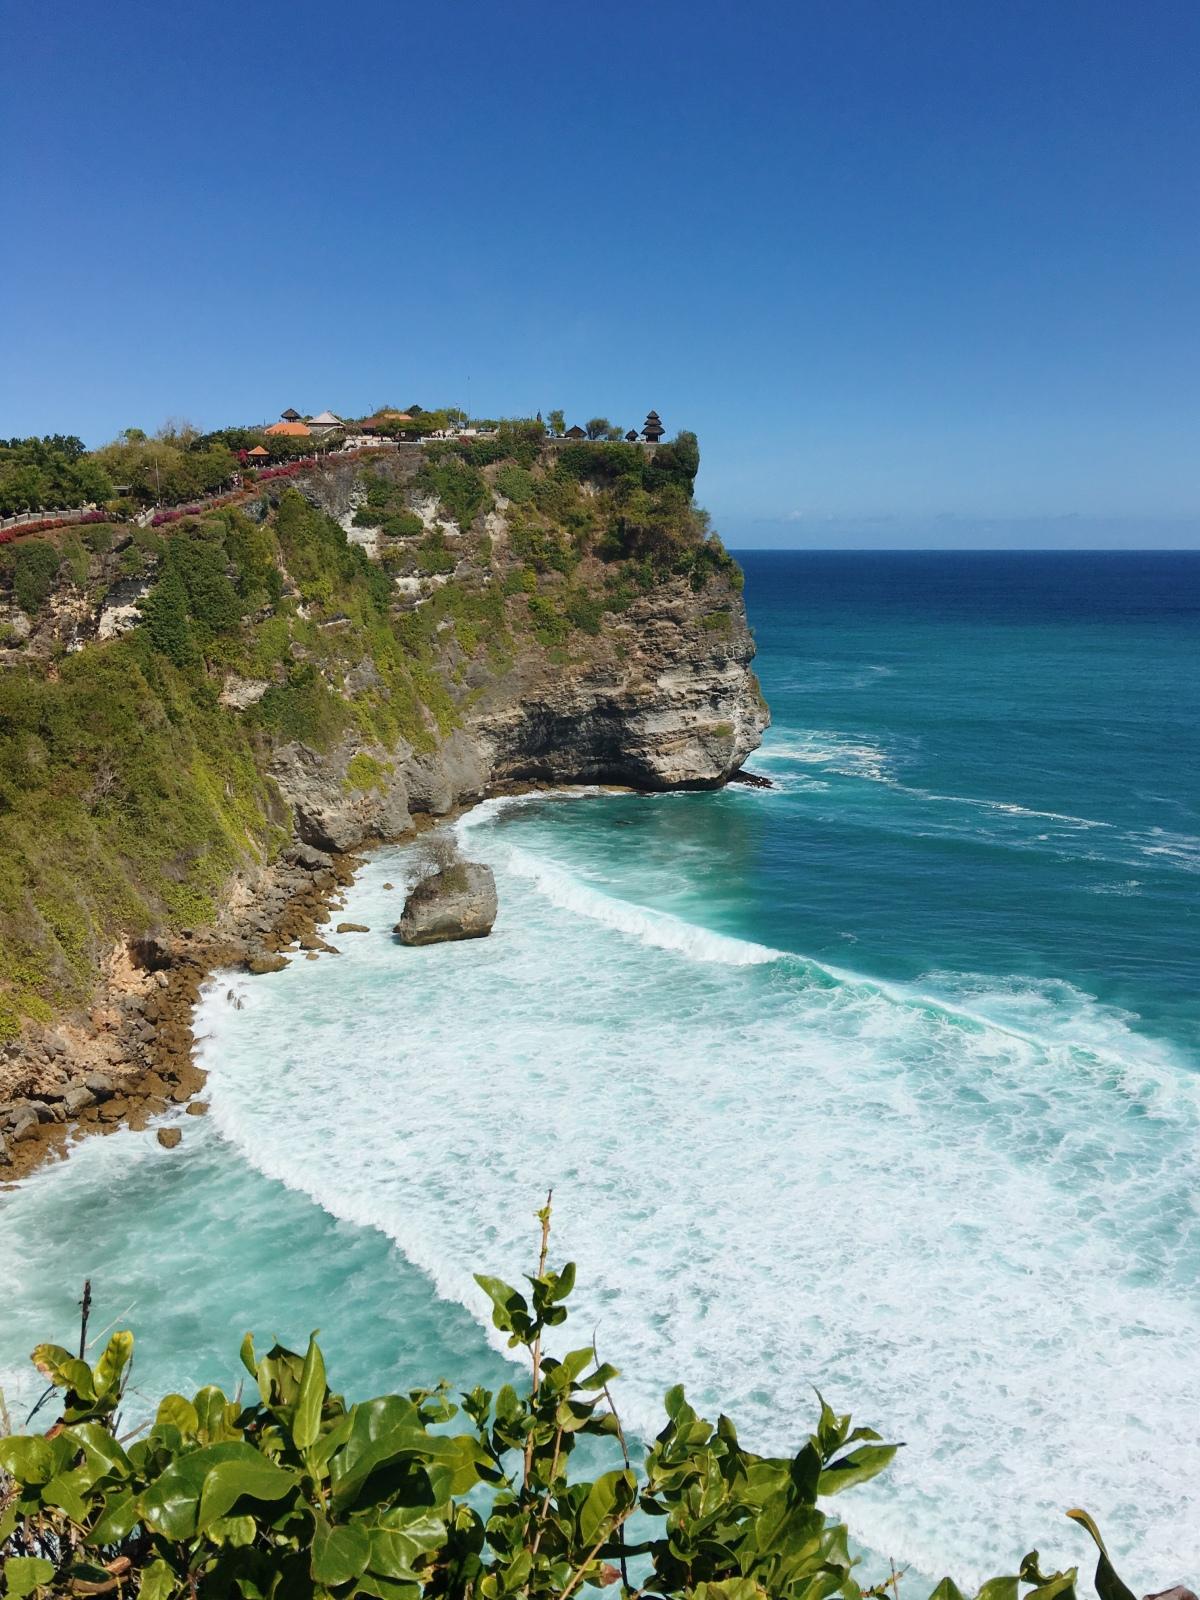 I set myself free in Bali   5 days 4nights